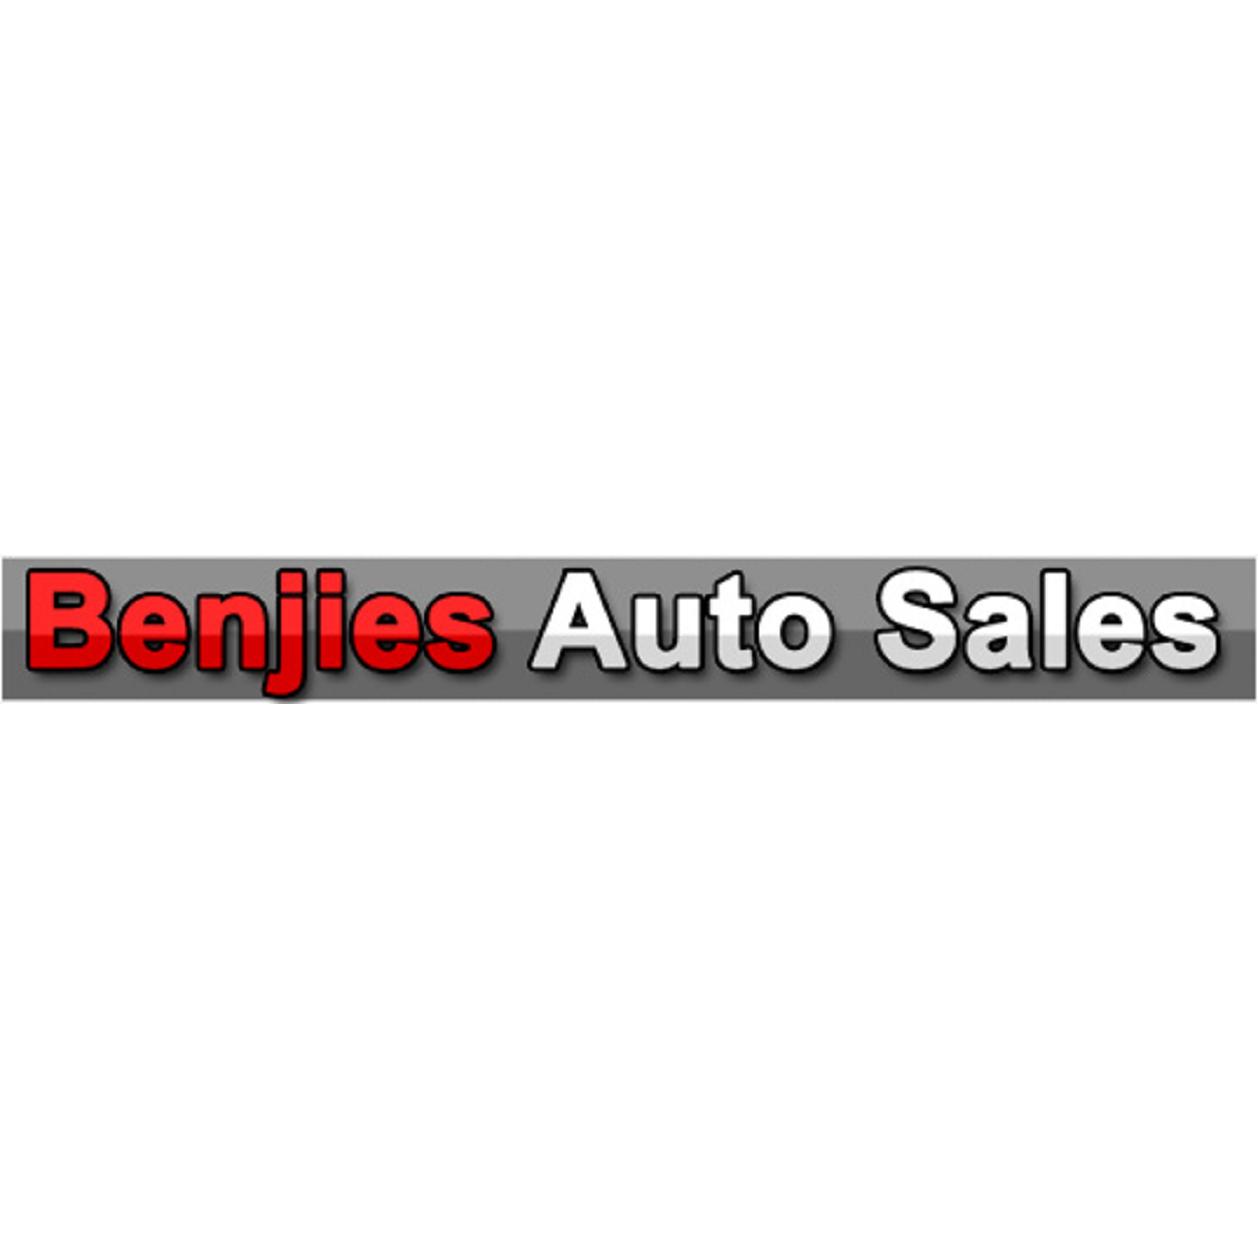 Benjie's Auto Sales - Leavenworth, KS - Auto Dealers